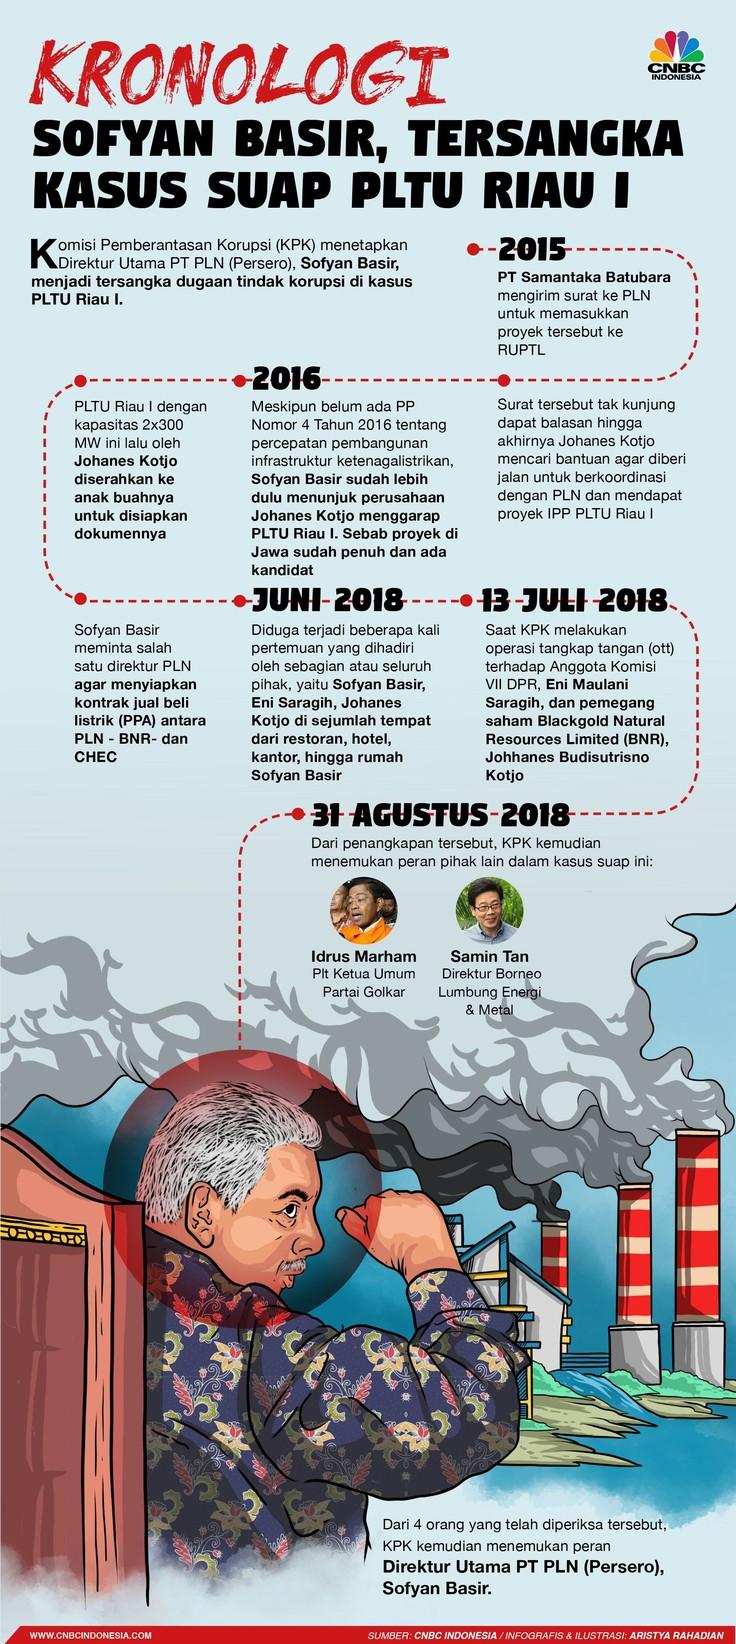 Begini kronologi Sofyan Basir jadi tersangka kasus dugaan suap PLTU Riau I